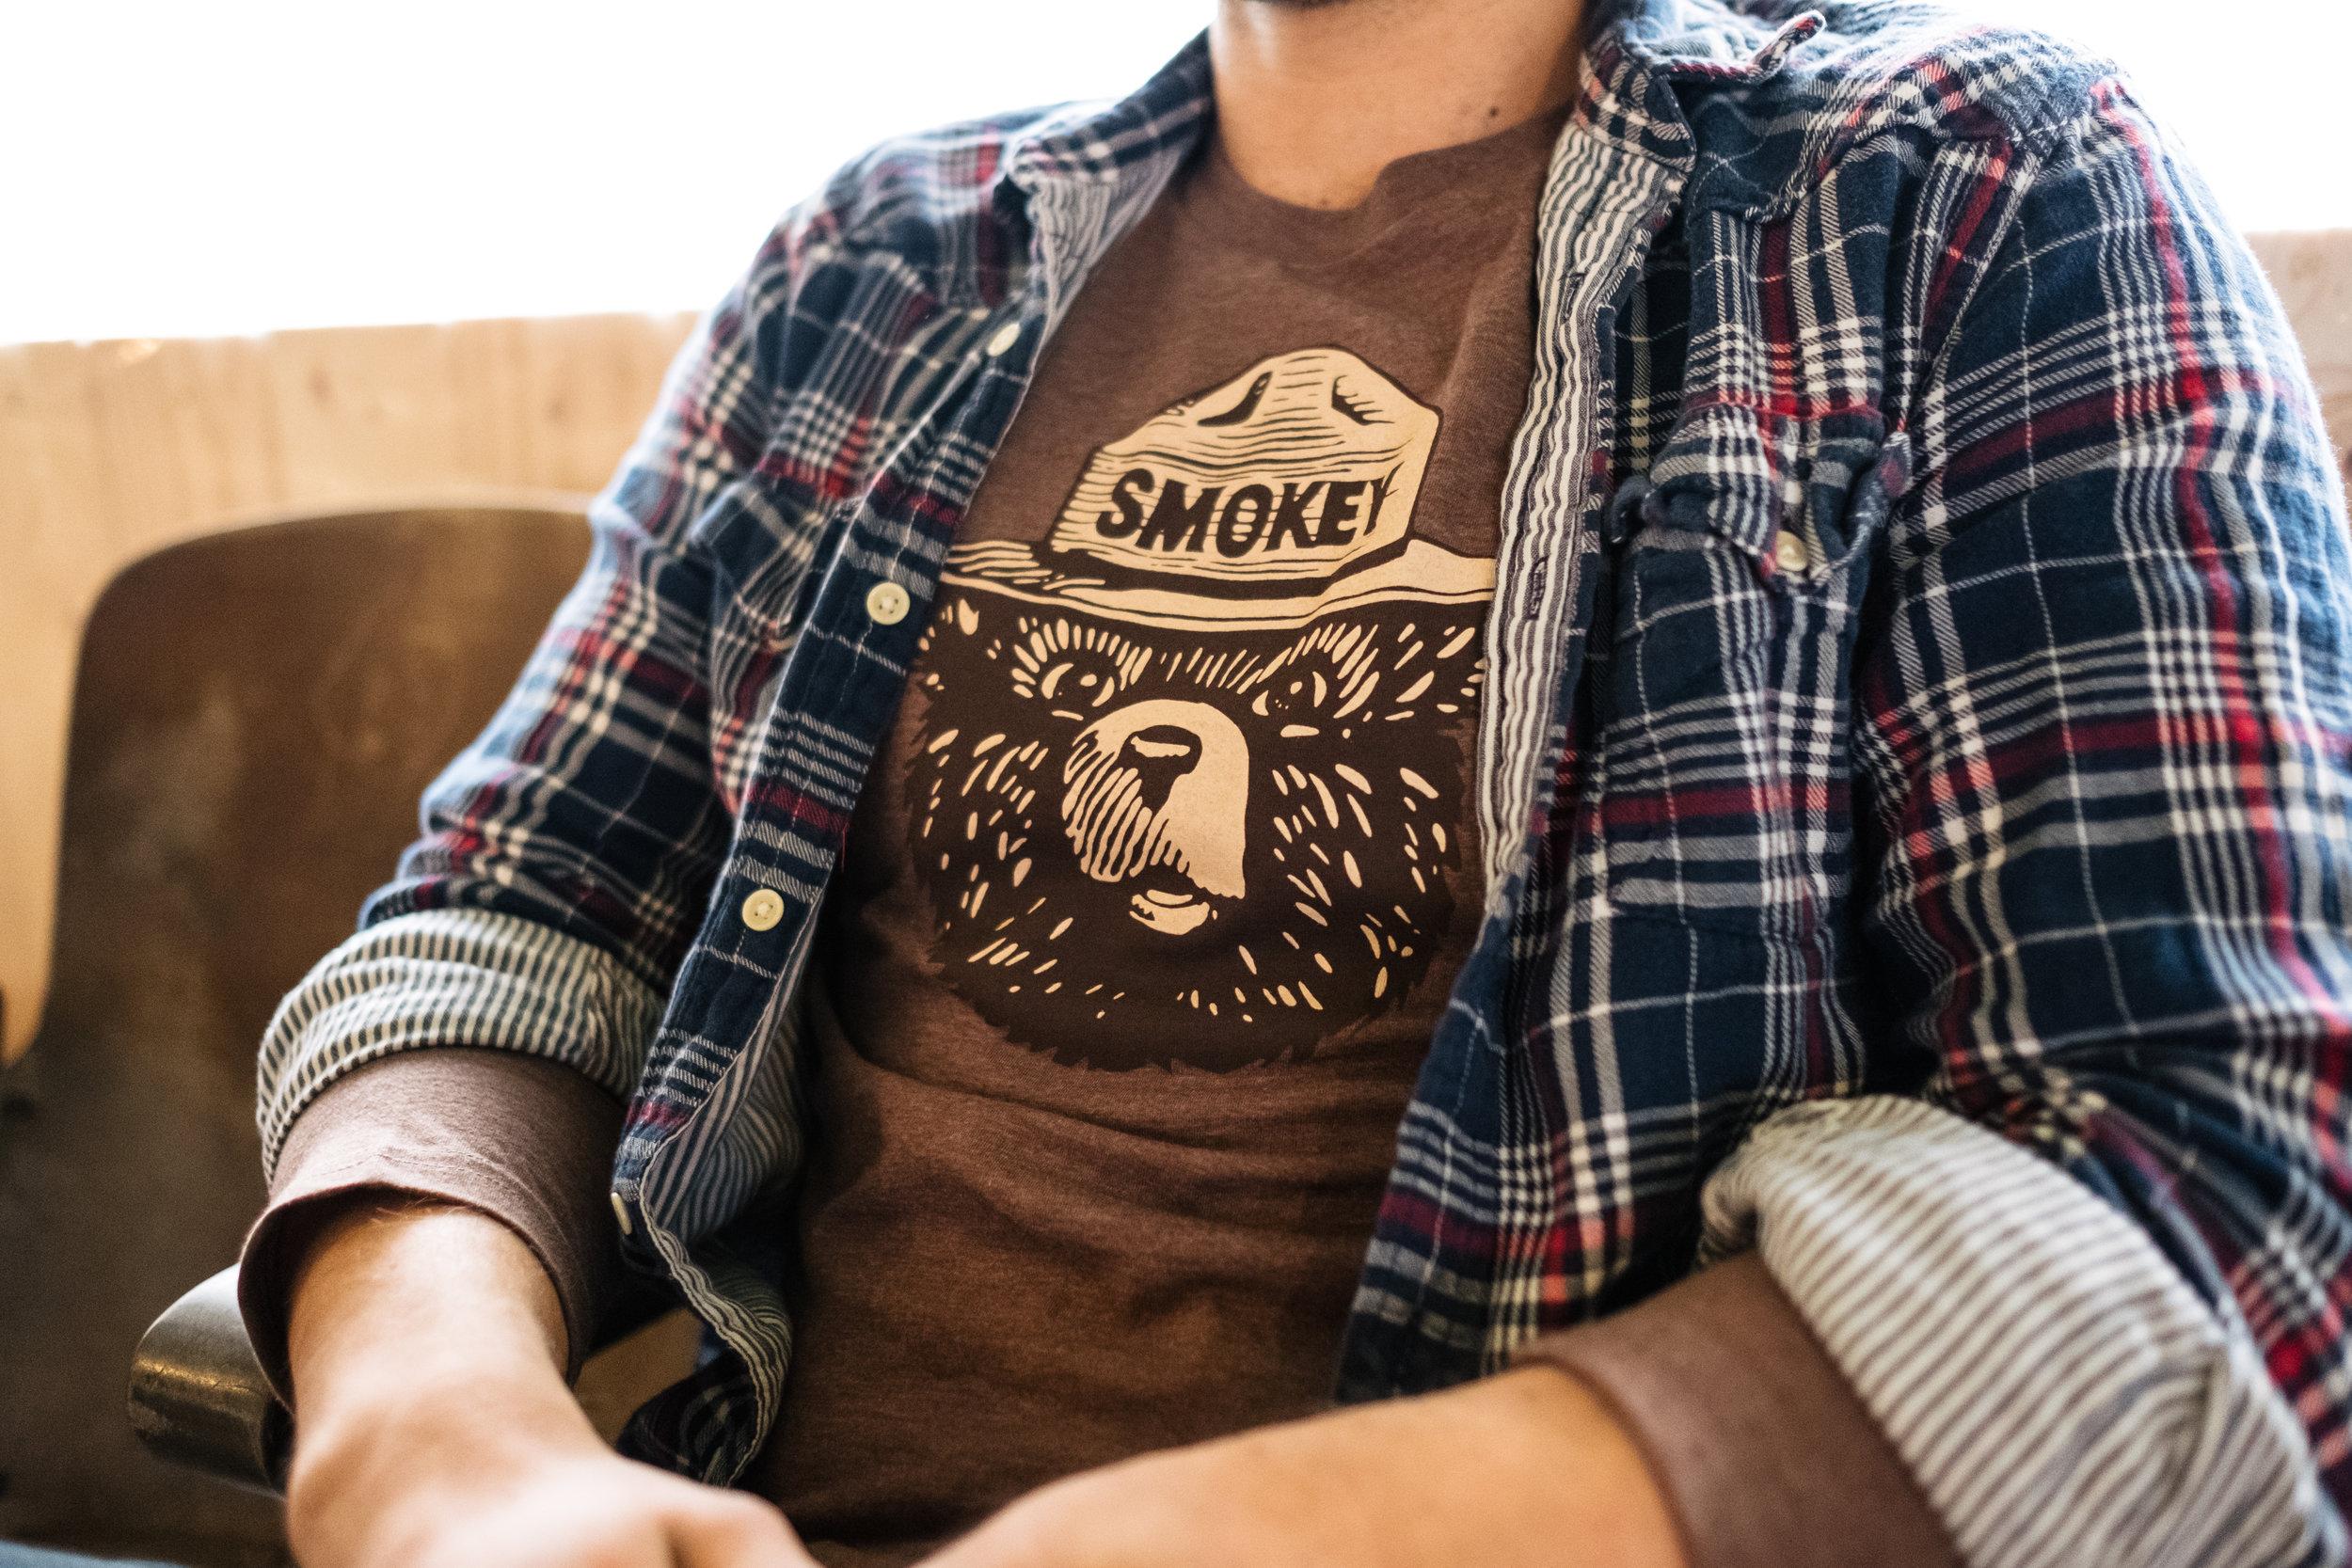 smokey-logo-tee-1.jpg